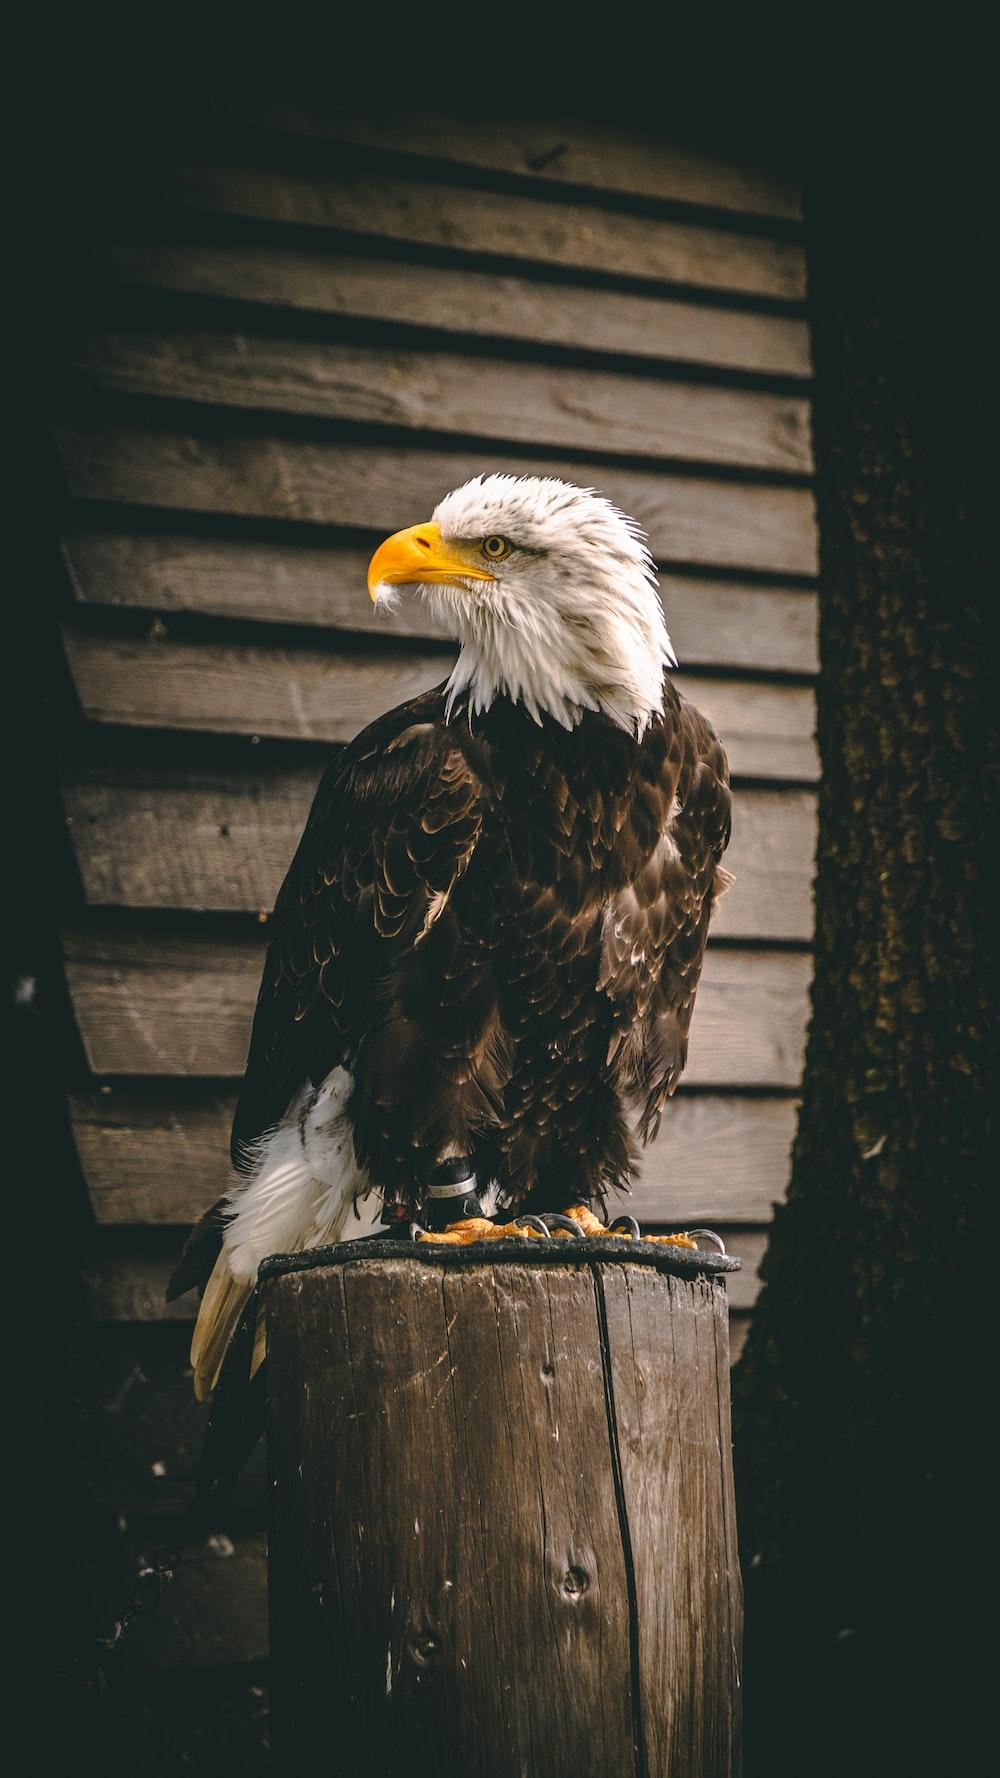 Eagle Wallpapers Free Hd Download 500 Hq Unsplash